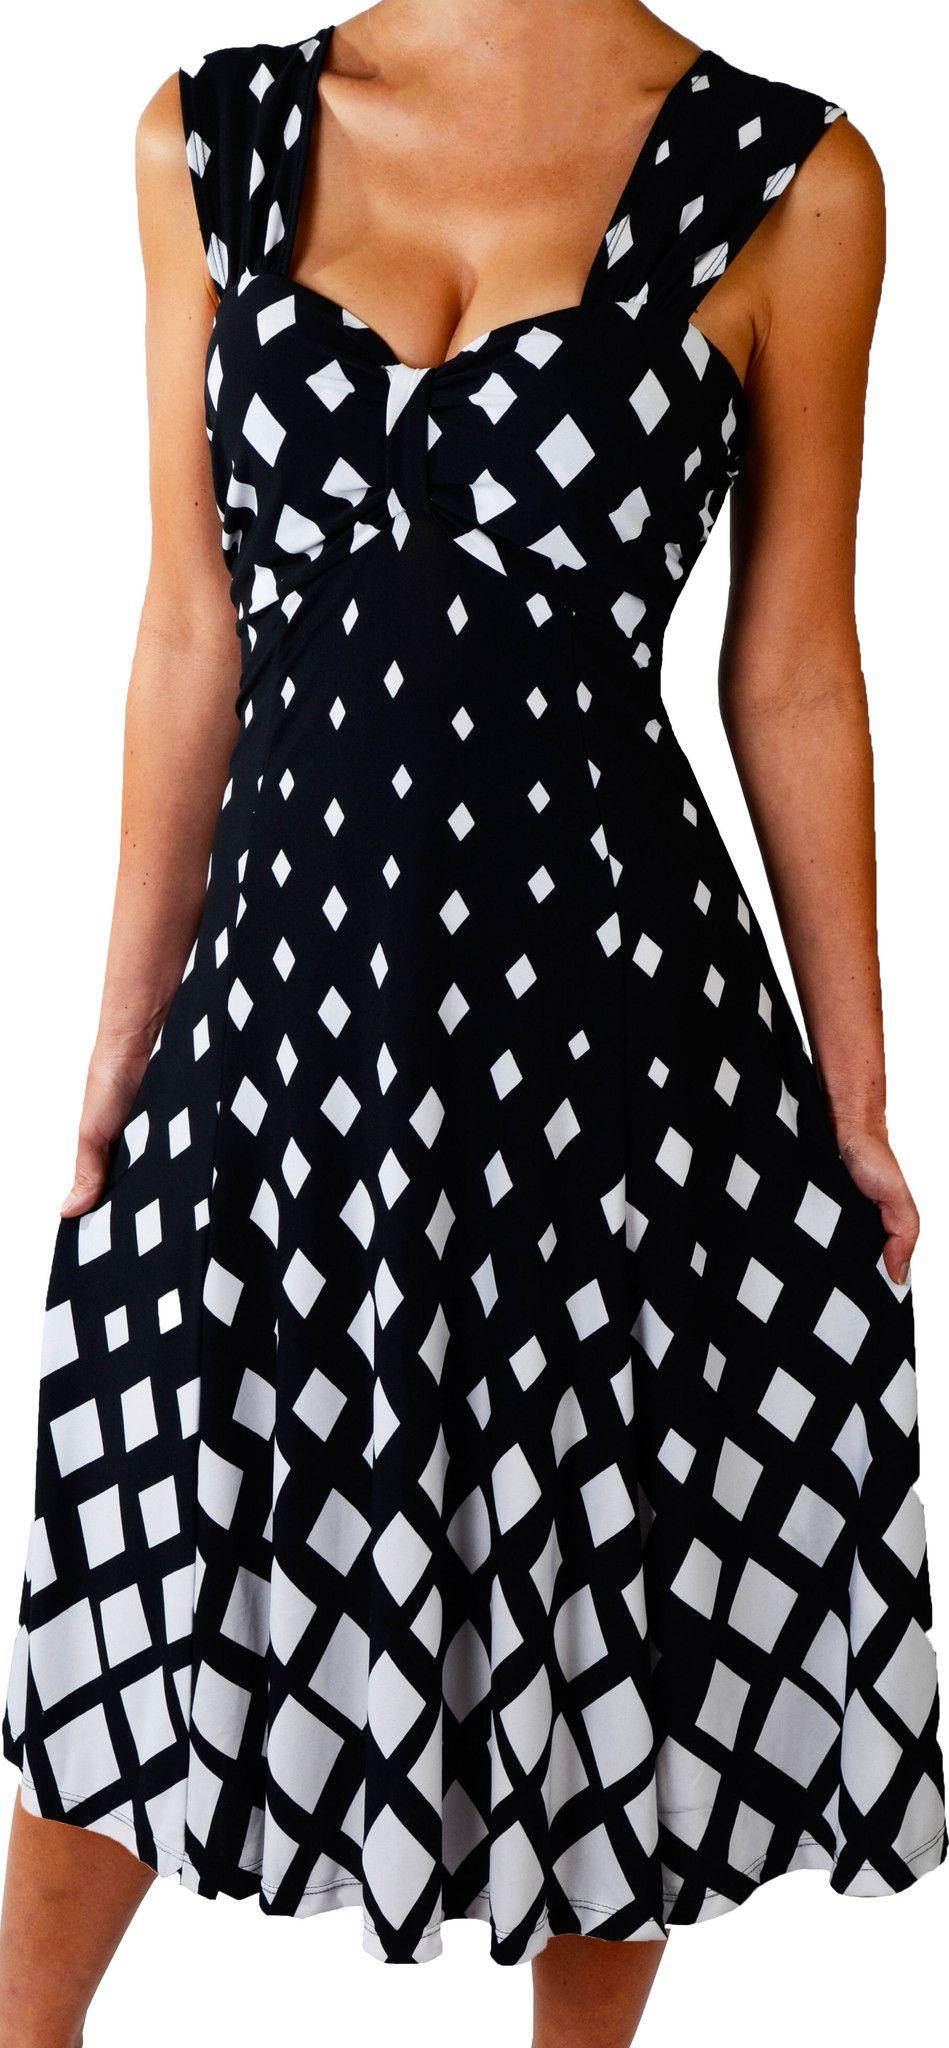 Plus size women diamond white black slimming cocktail dress made in